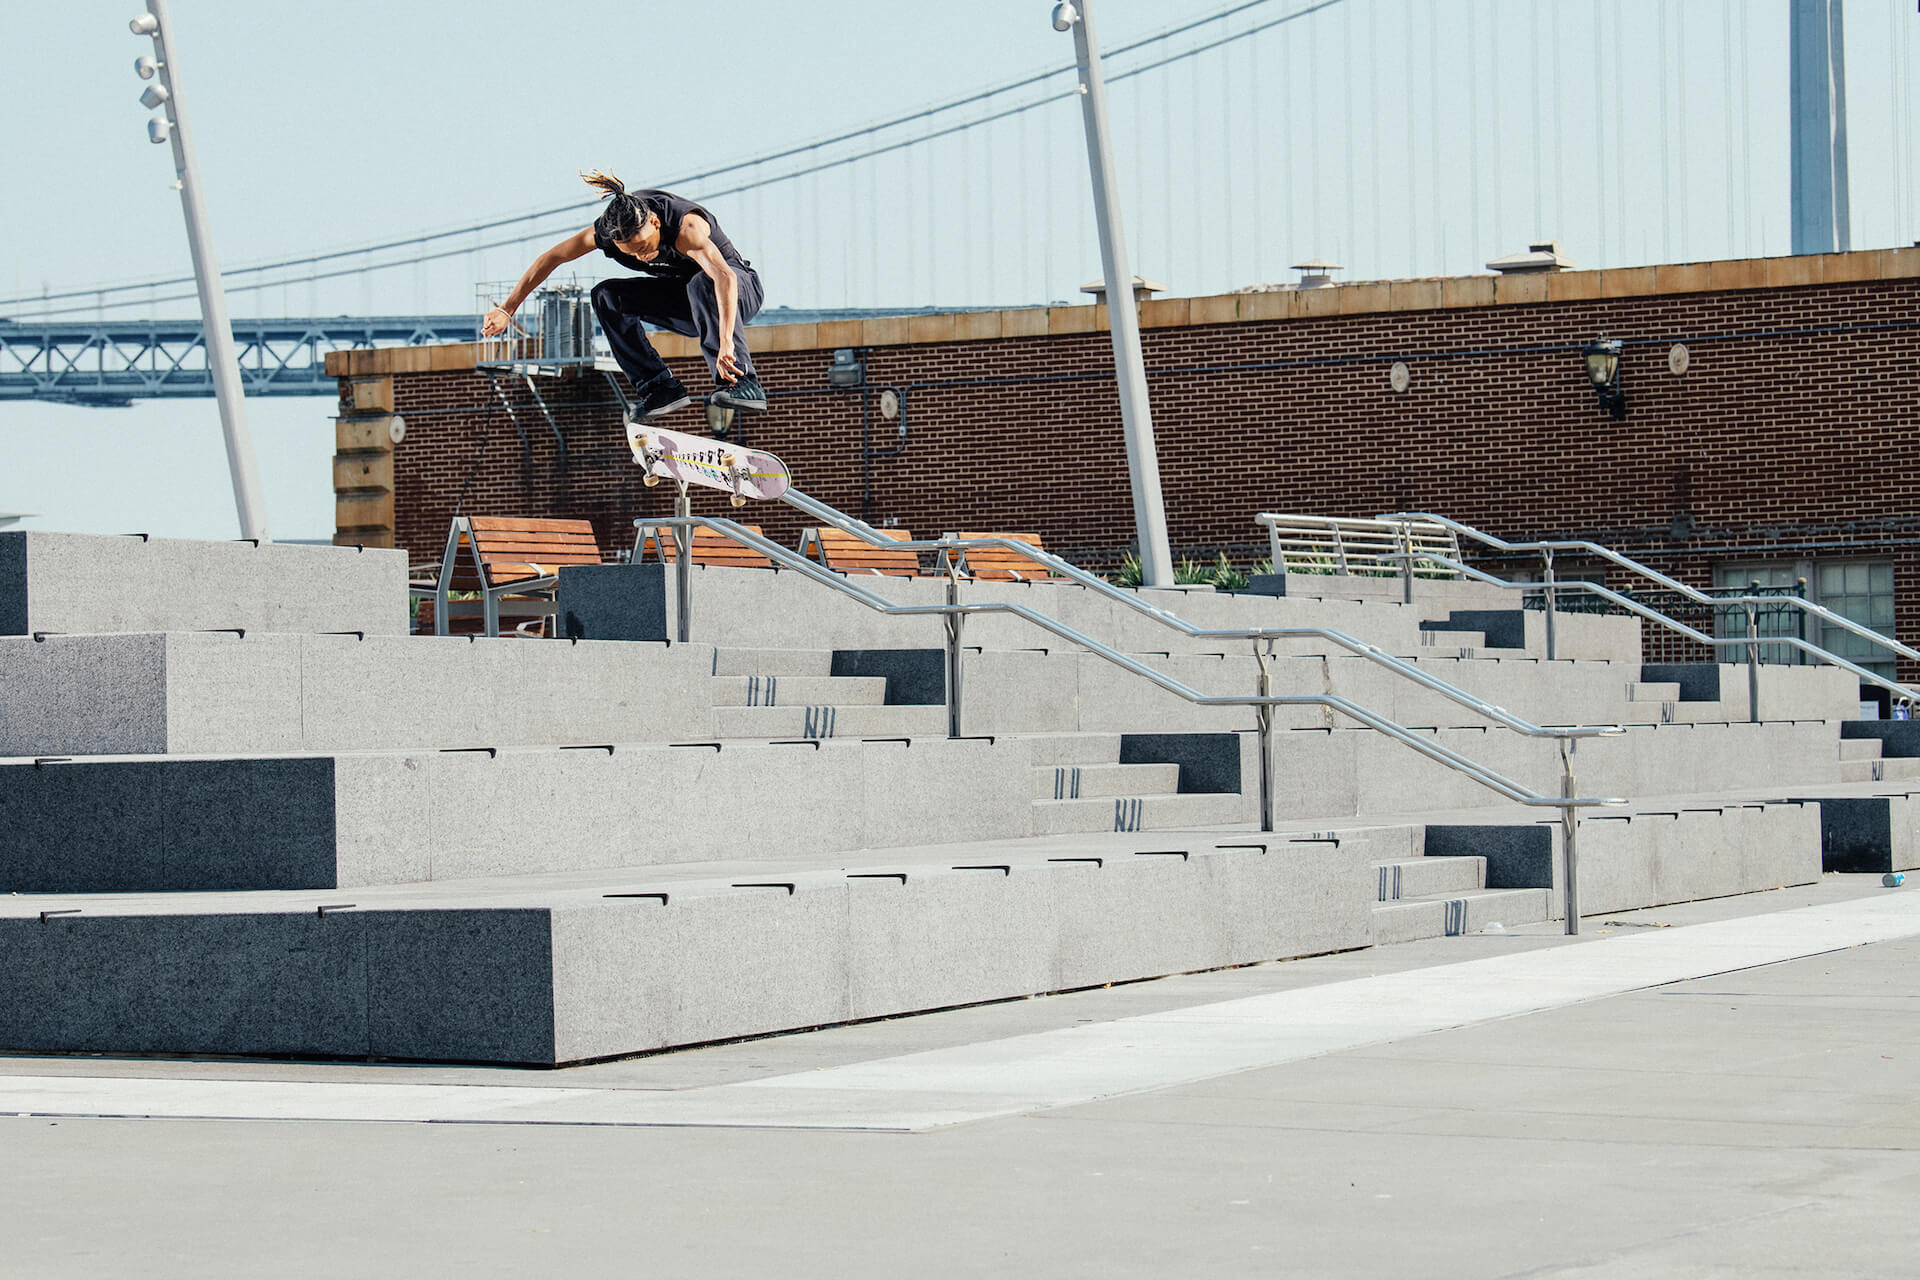 adidas SkateboardingとTHRASHERがコラボ!プロスケーターTyshawn Jonesのシグネチャーモデル&新型SUPERSTARが登場 life201126_adidas_skateboarding_14